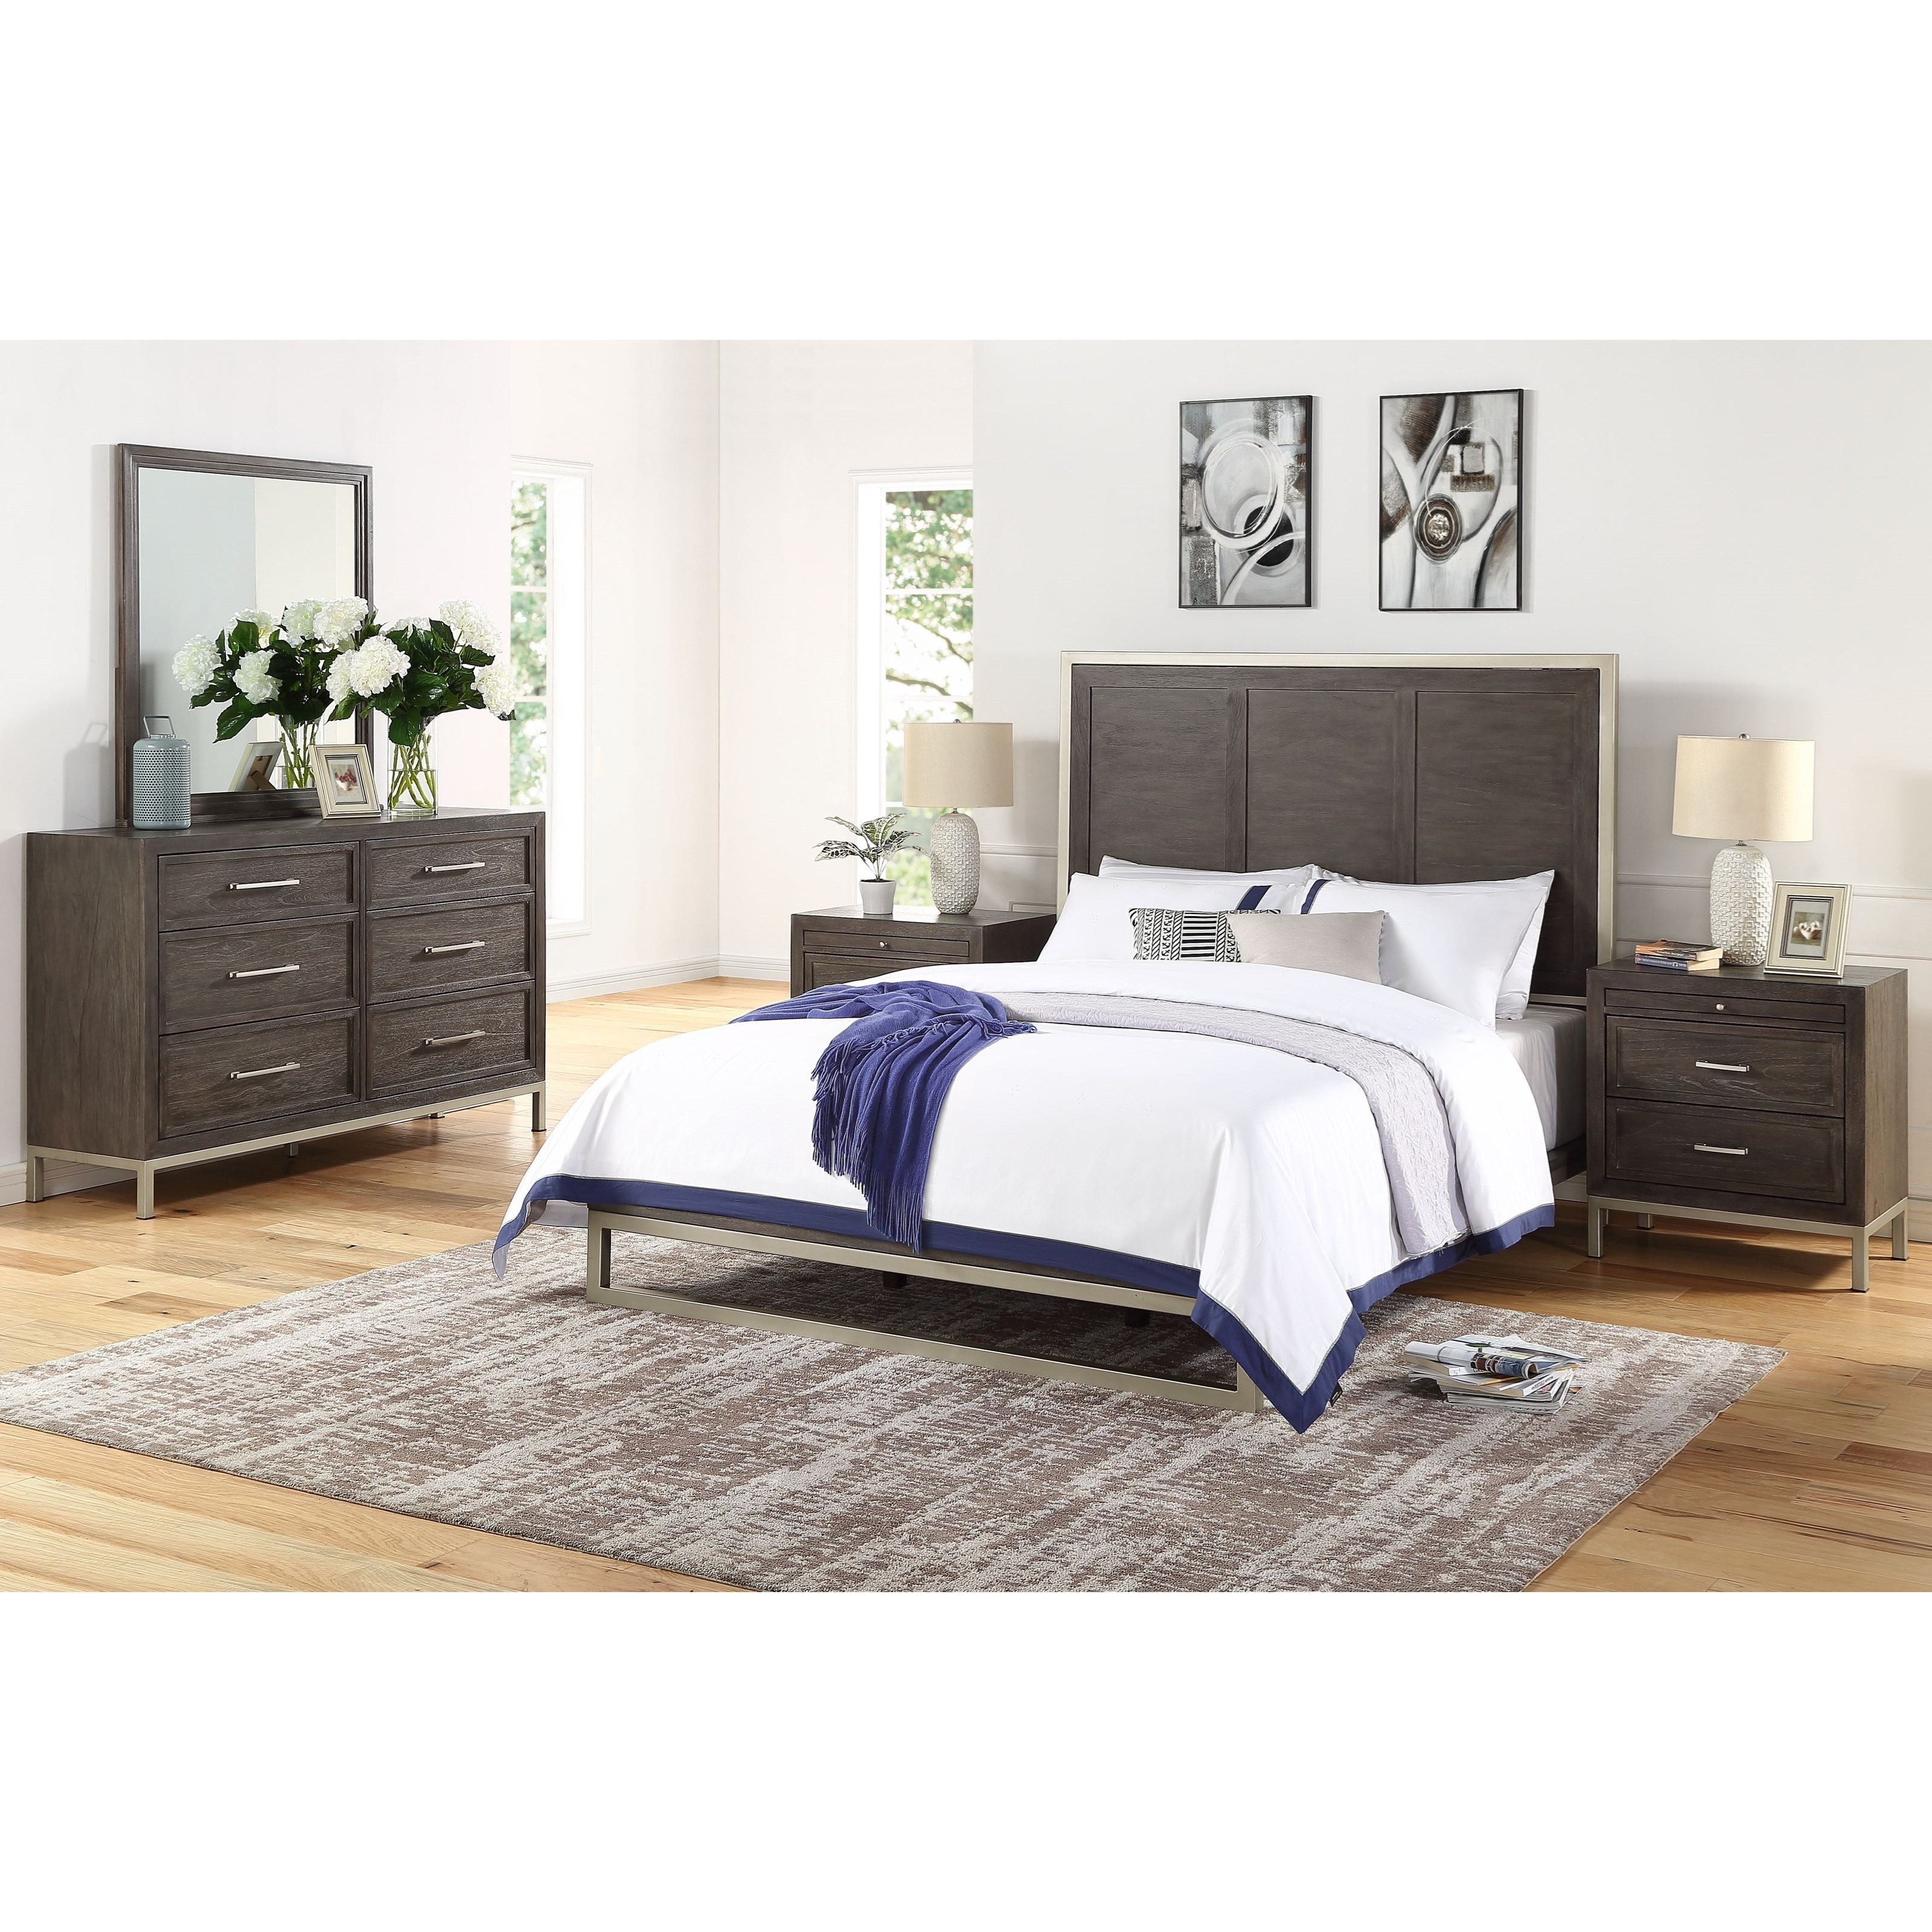 Broomfield King Bedroom Group by Steve Silver at Van Hill Furniture